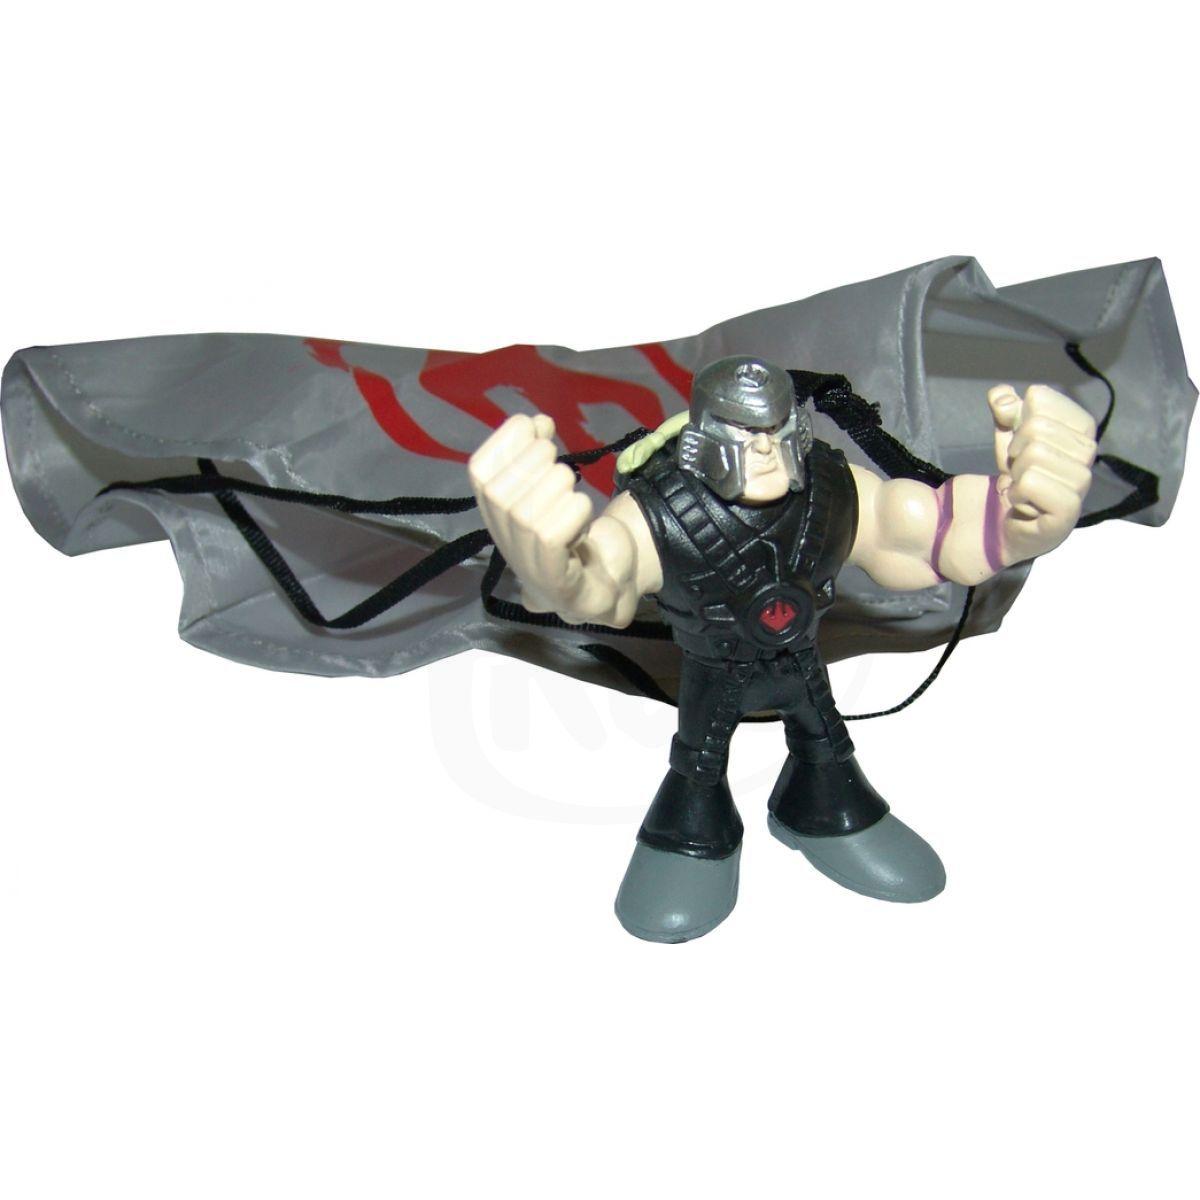 EP Line Želvy Ninja TMNT mini mutants sada s padákem a figurkou - Mike a Elite Foot